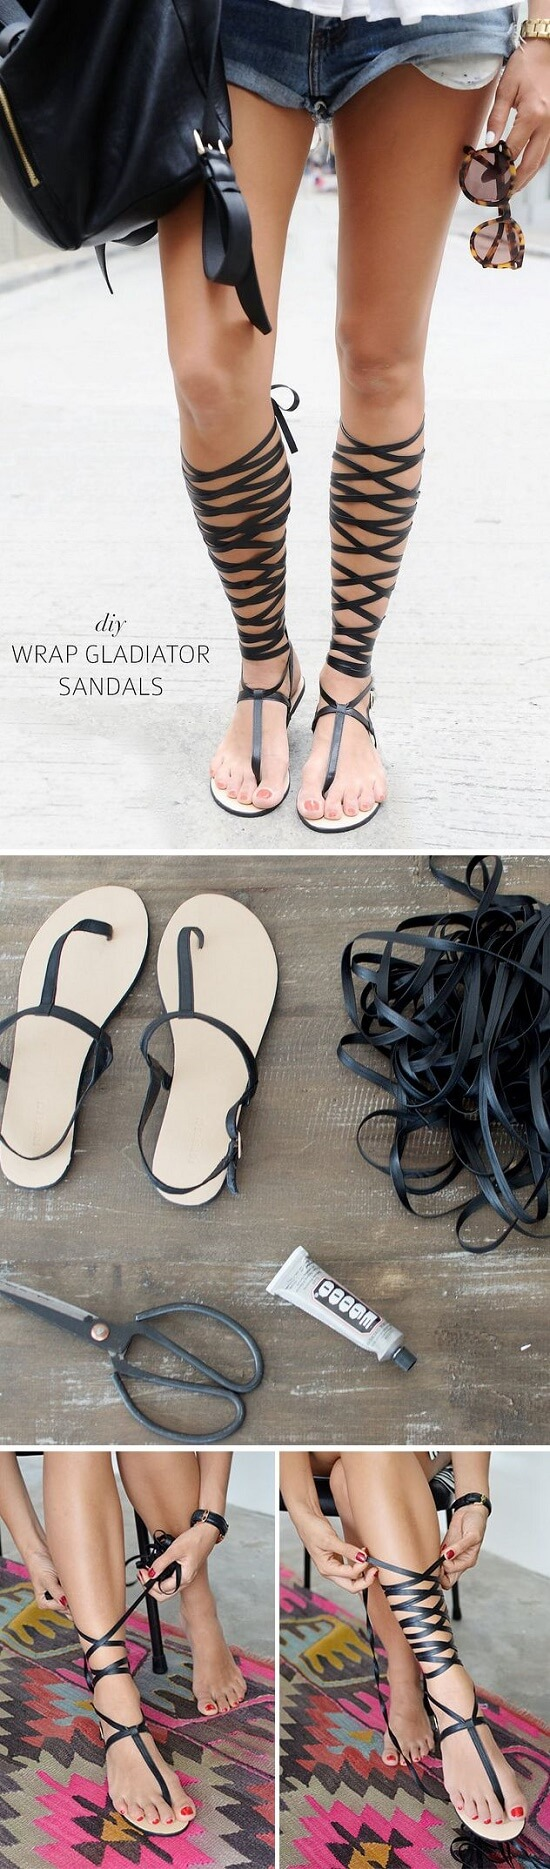 sandalias-07